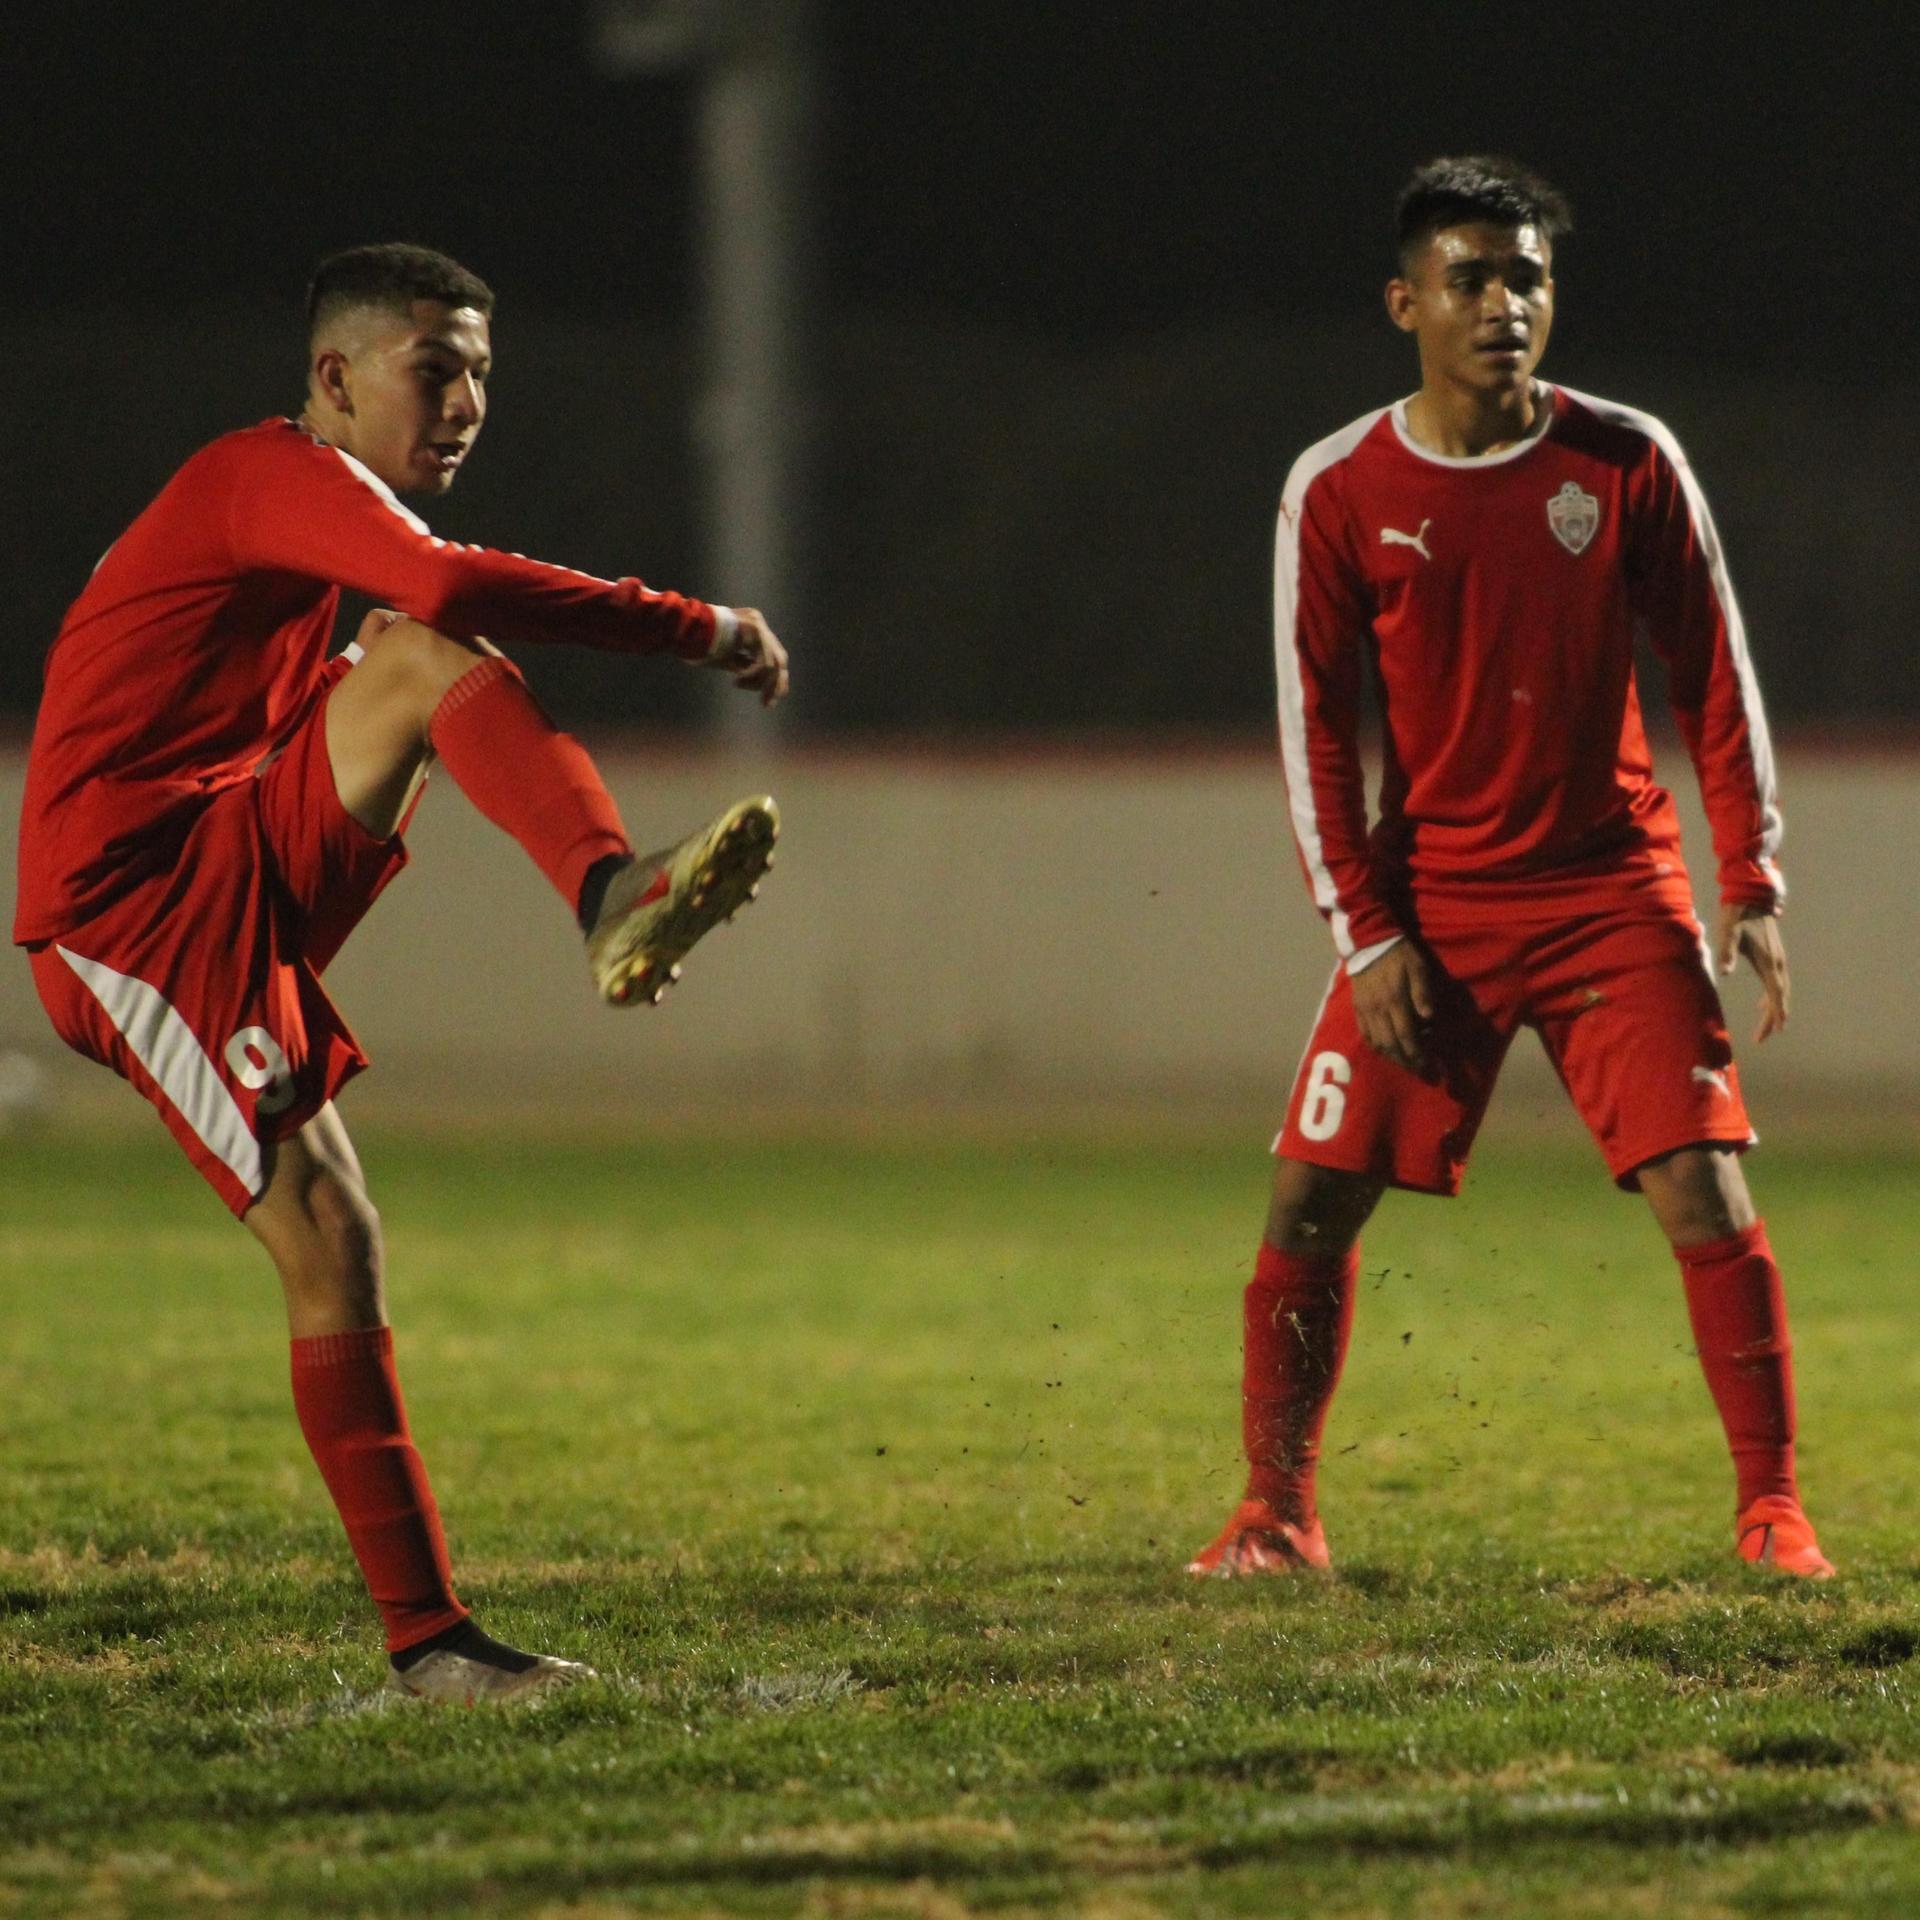 Jose Renteria and Arwin Brizo with the ball